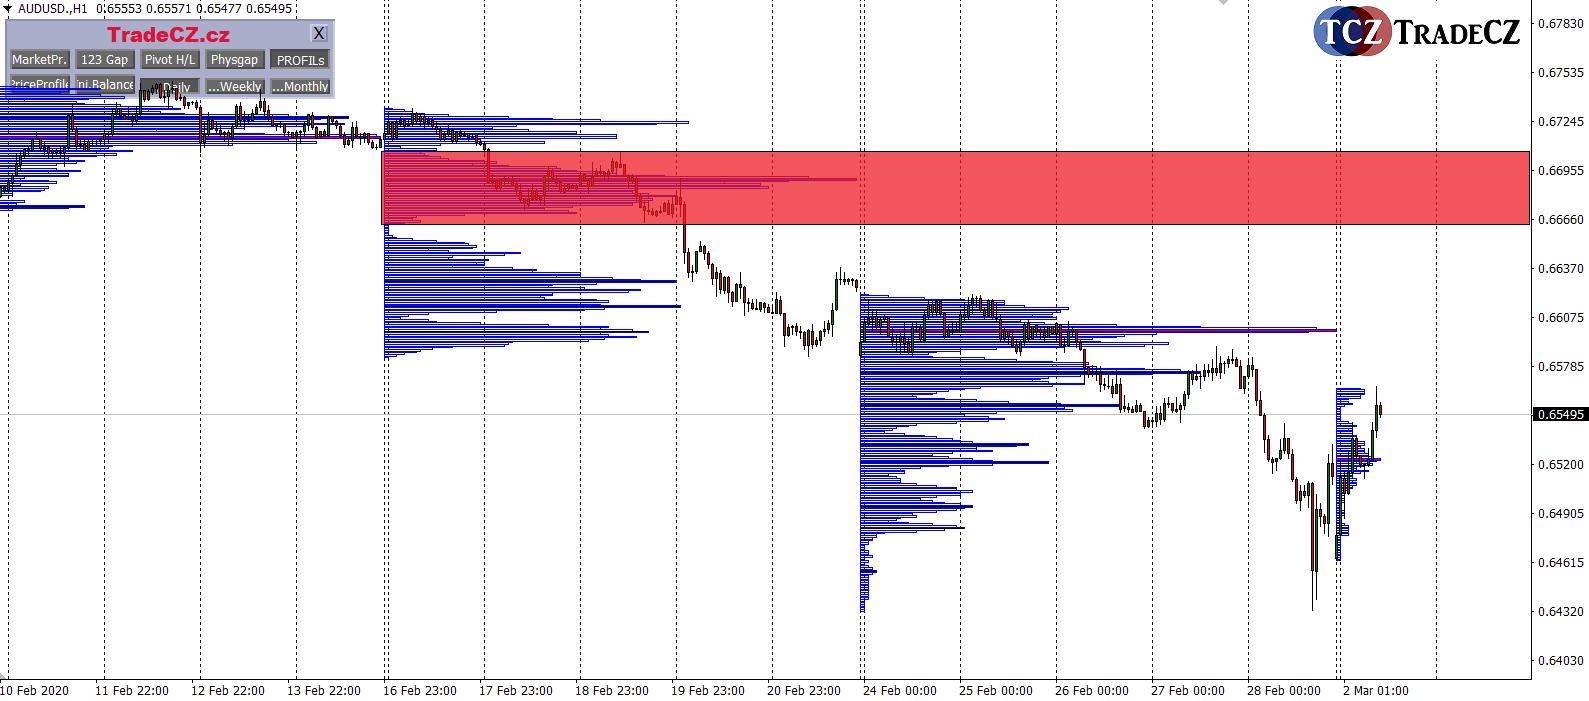 Forex AUDUSD market profile